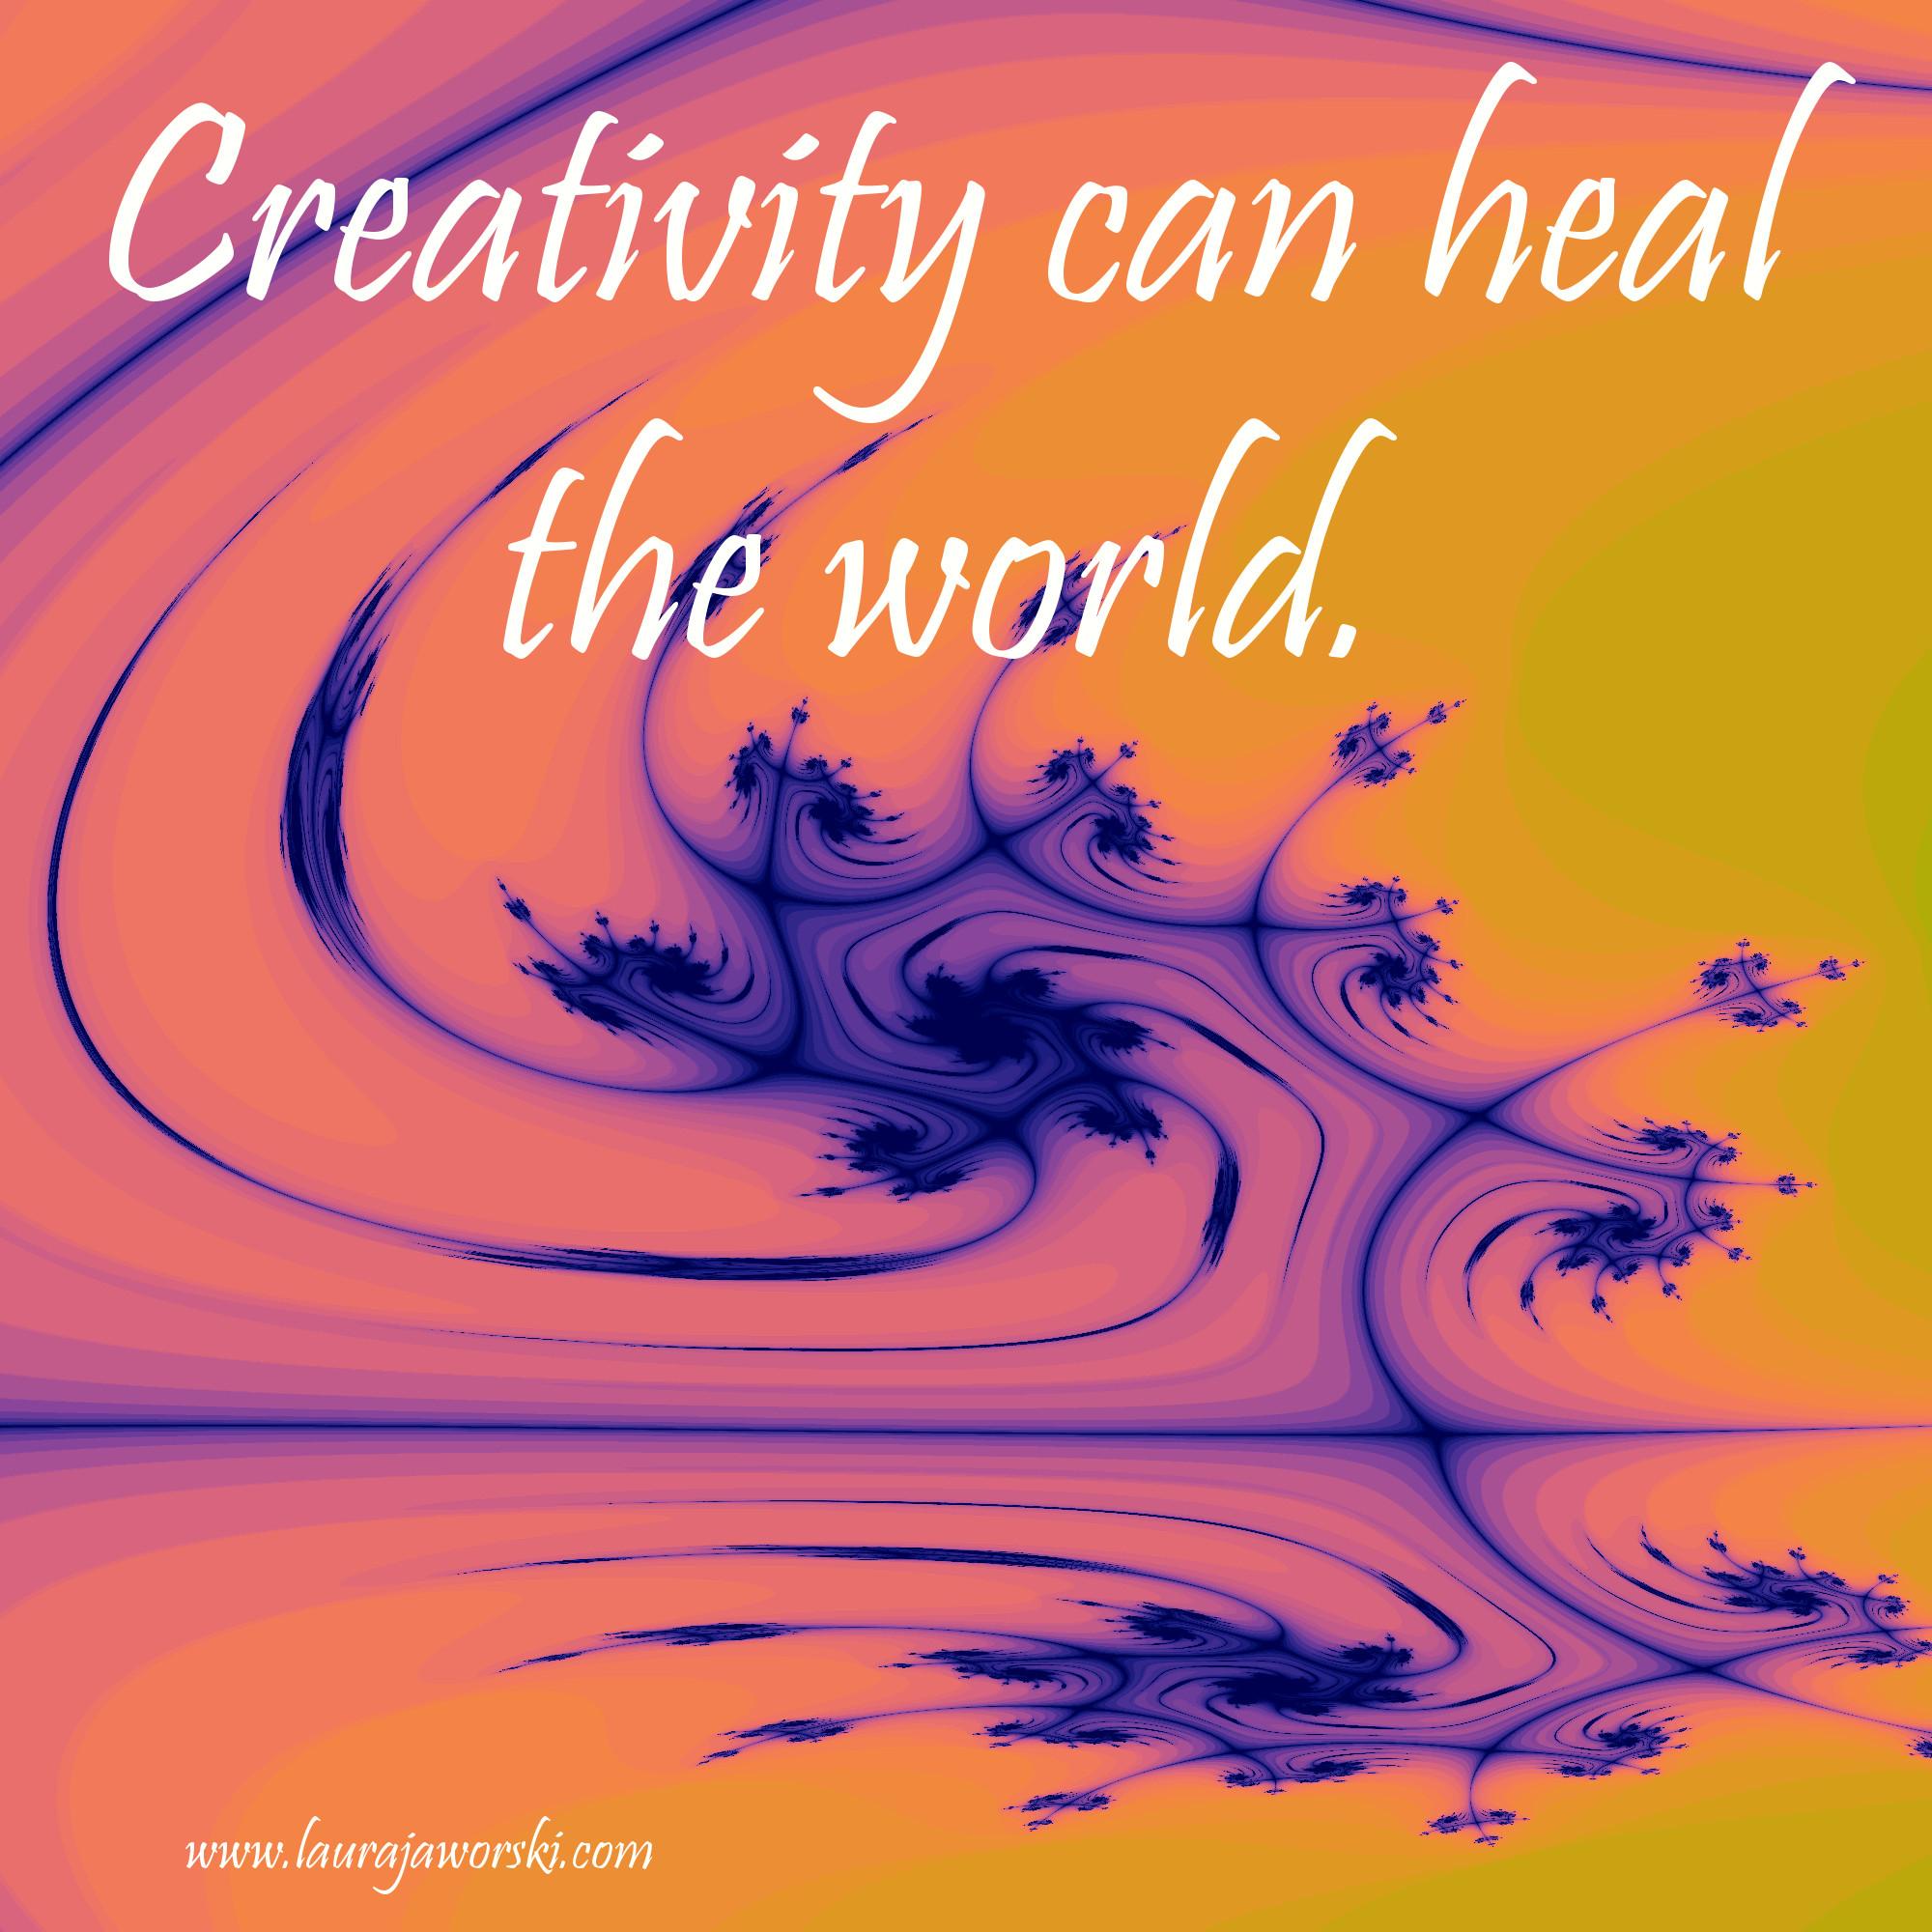 Creativity | www.laurajaworski.com